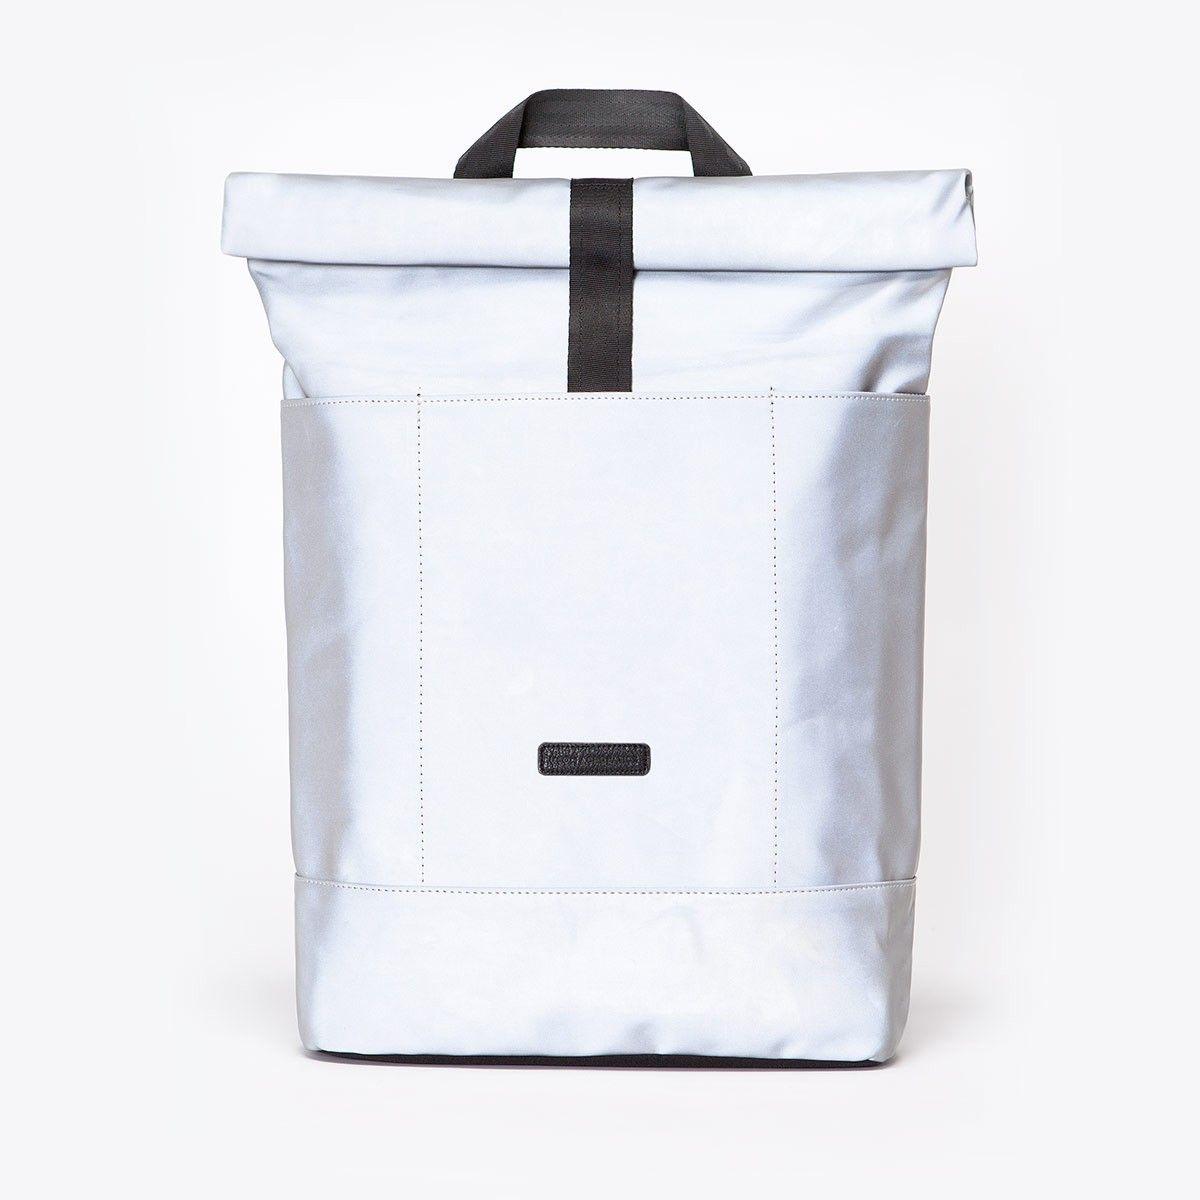 ddf79267120e Ucon Acrobatics - Hajo Backpack - Minimalistic designed Backpacks from  Berlin